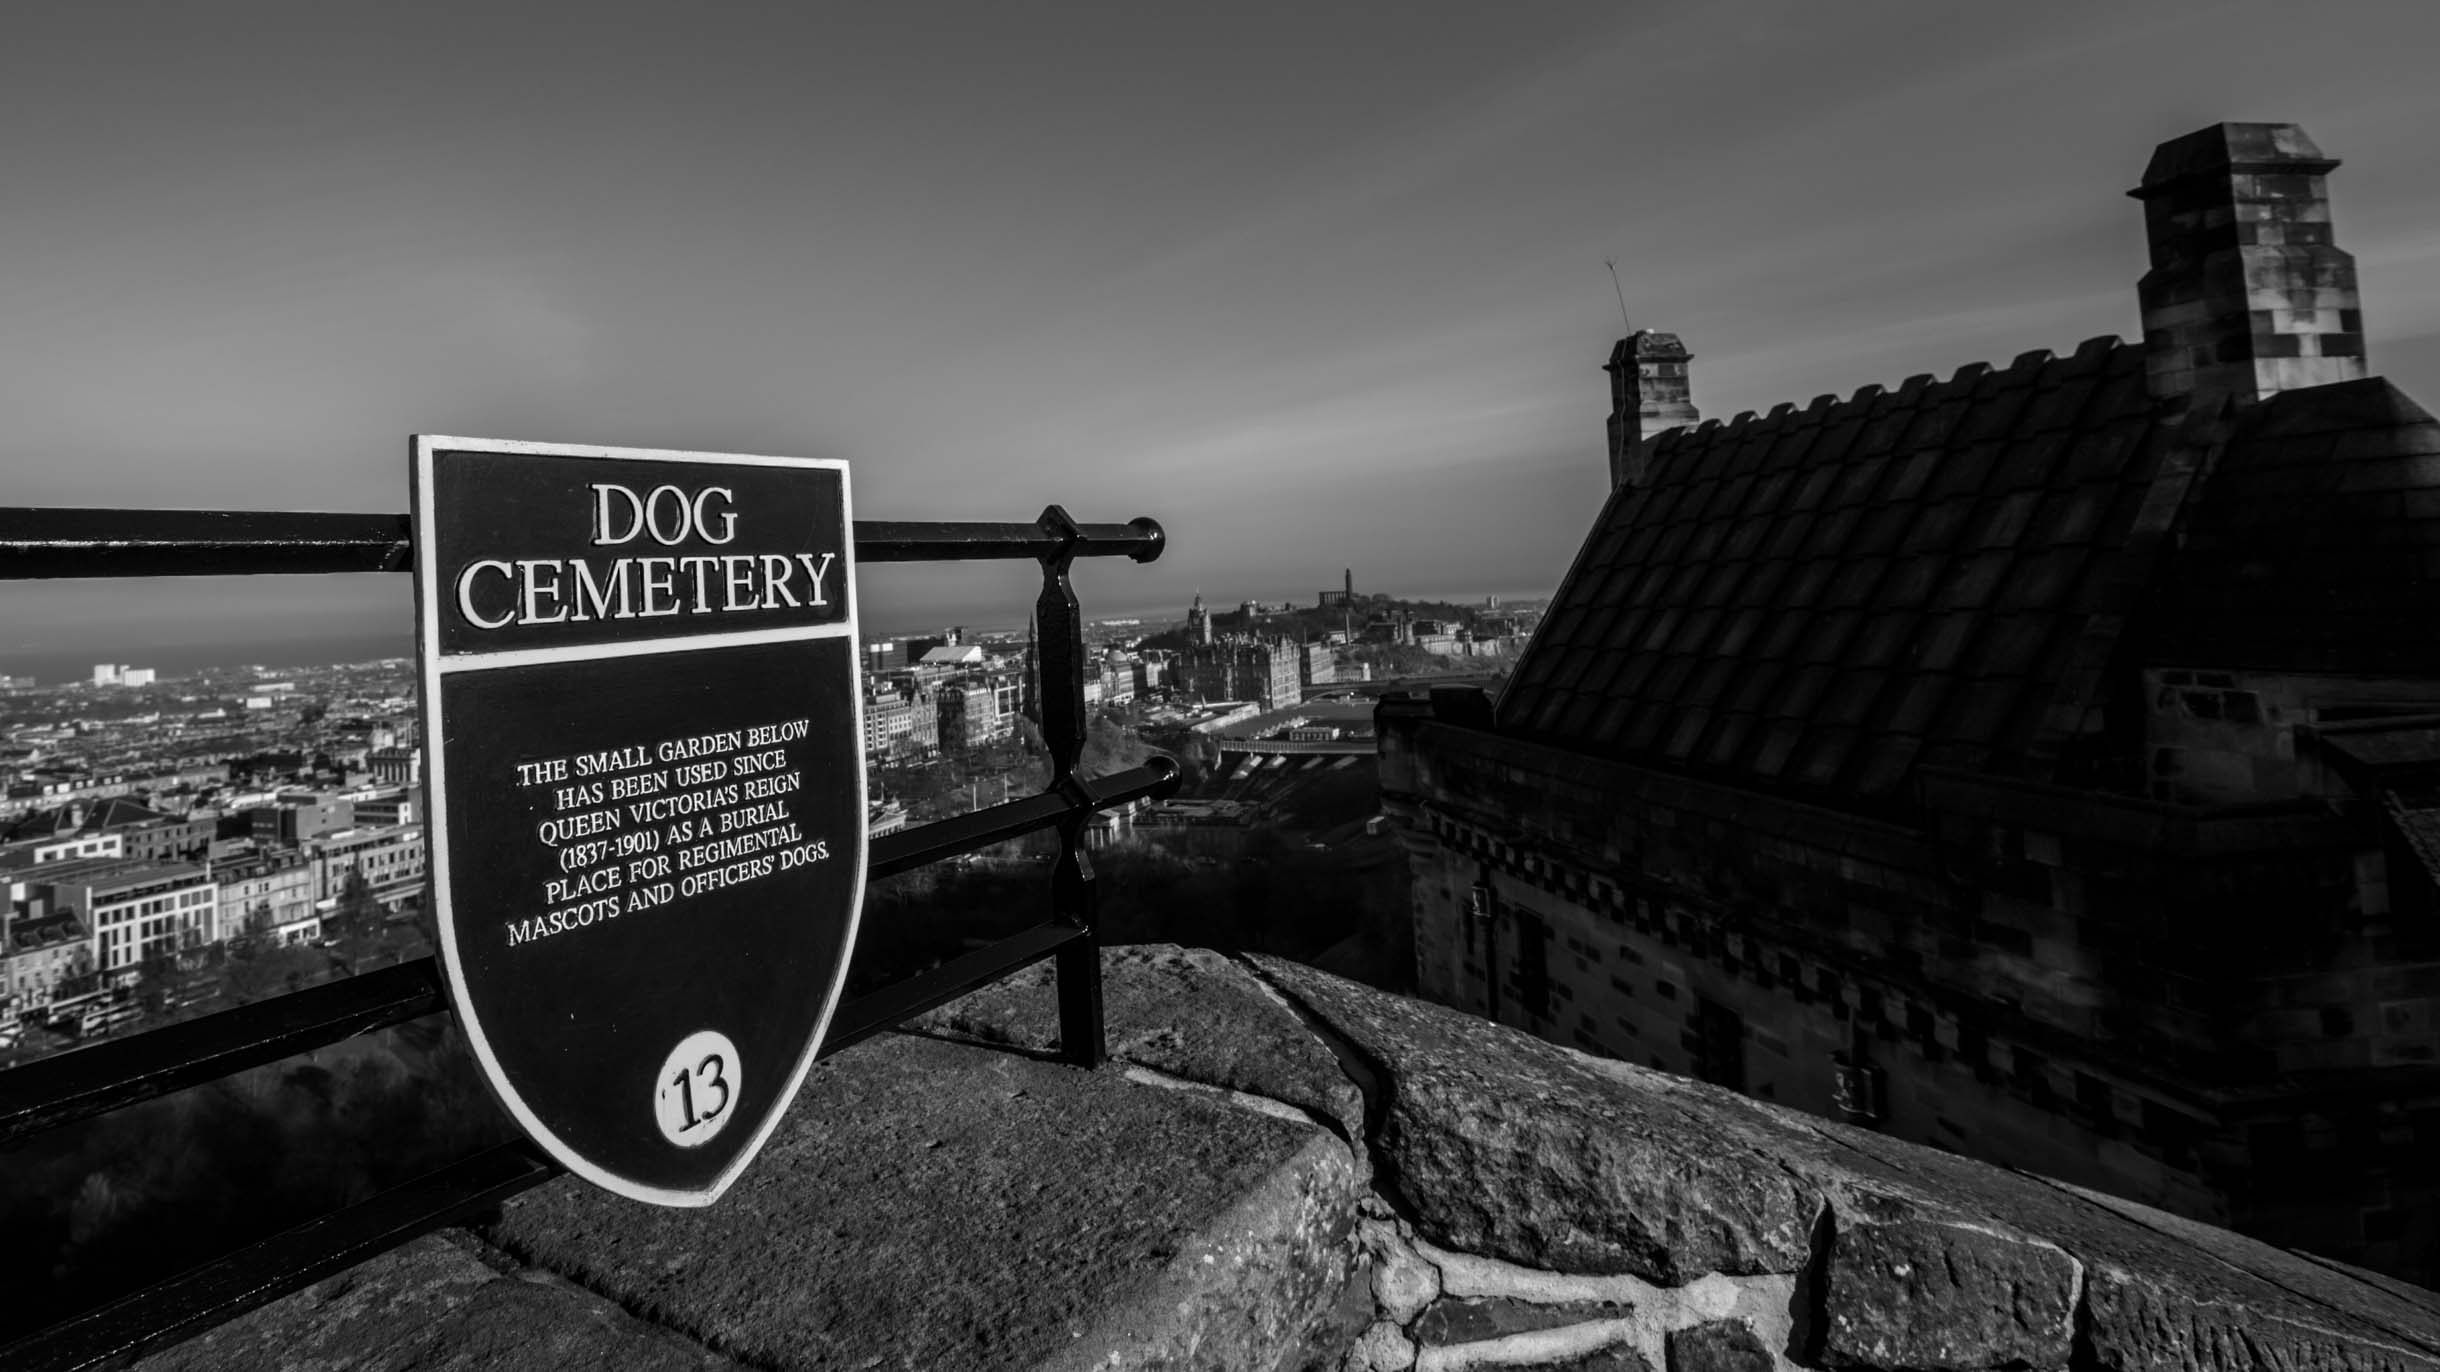 Picture Taken While Exploring Edinburgh - dog cemetery edinburgh castle